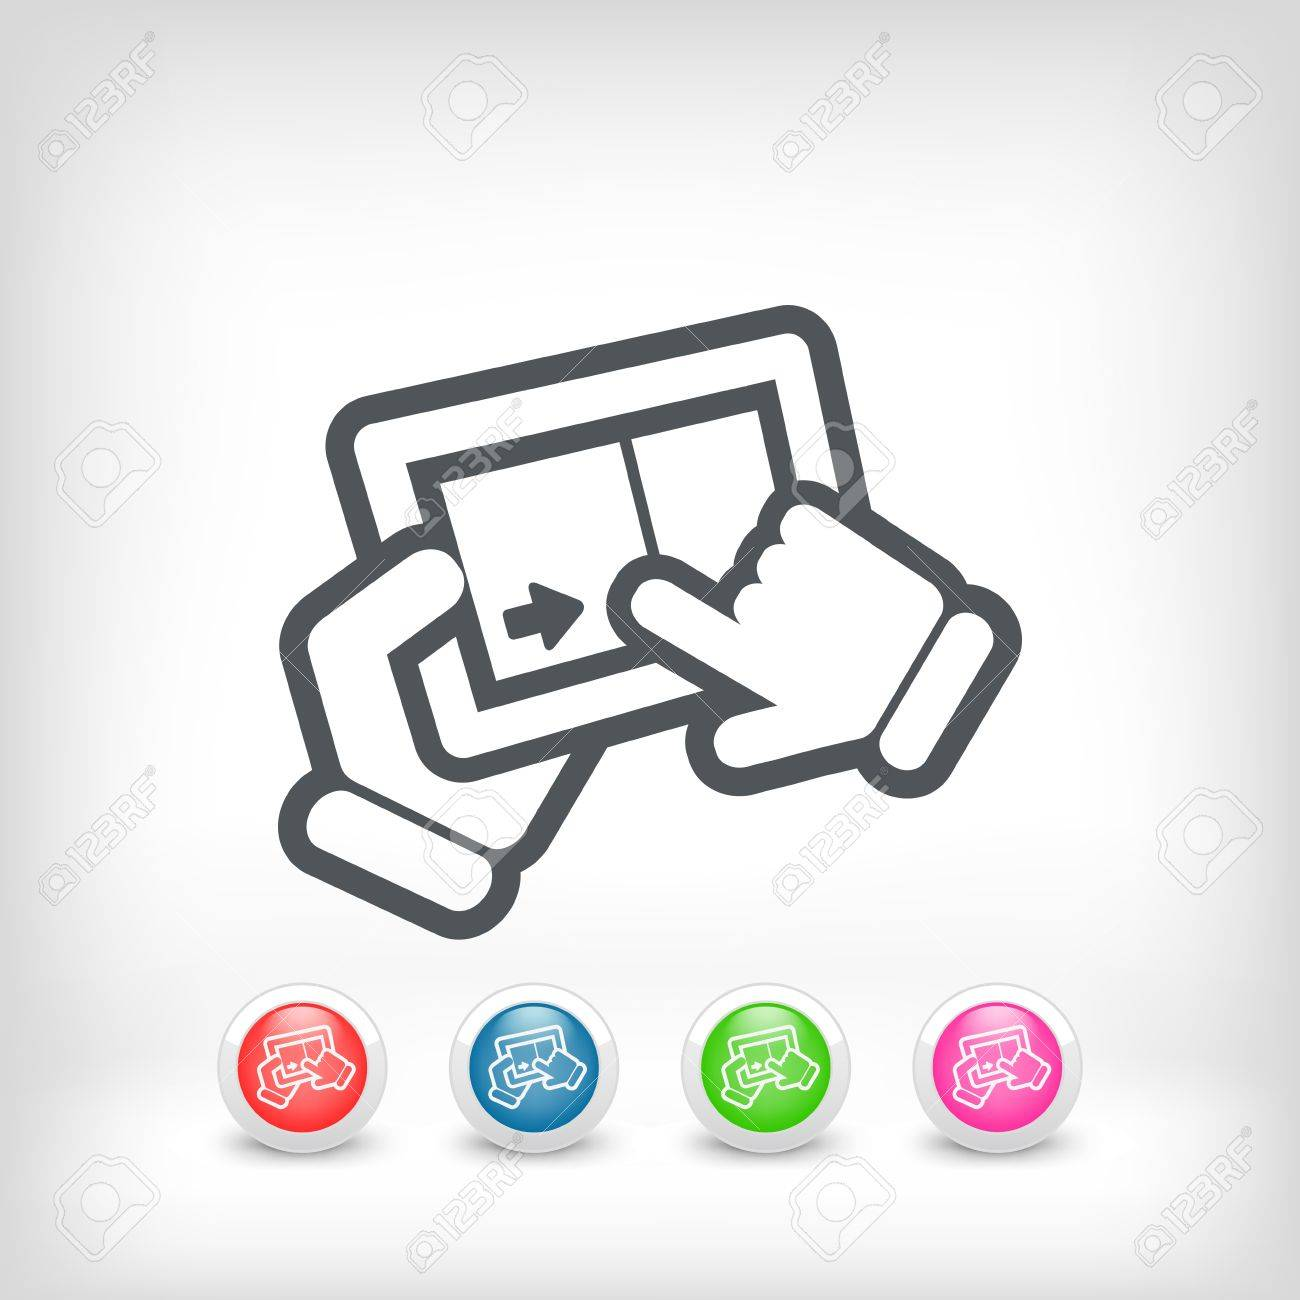 Slide touchscreen Stock Vector - 20236236